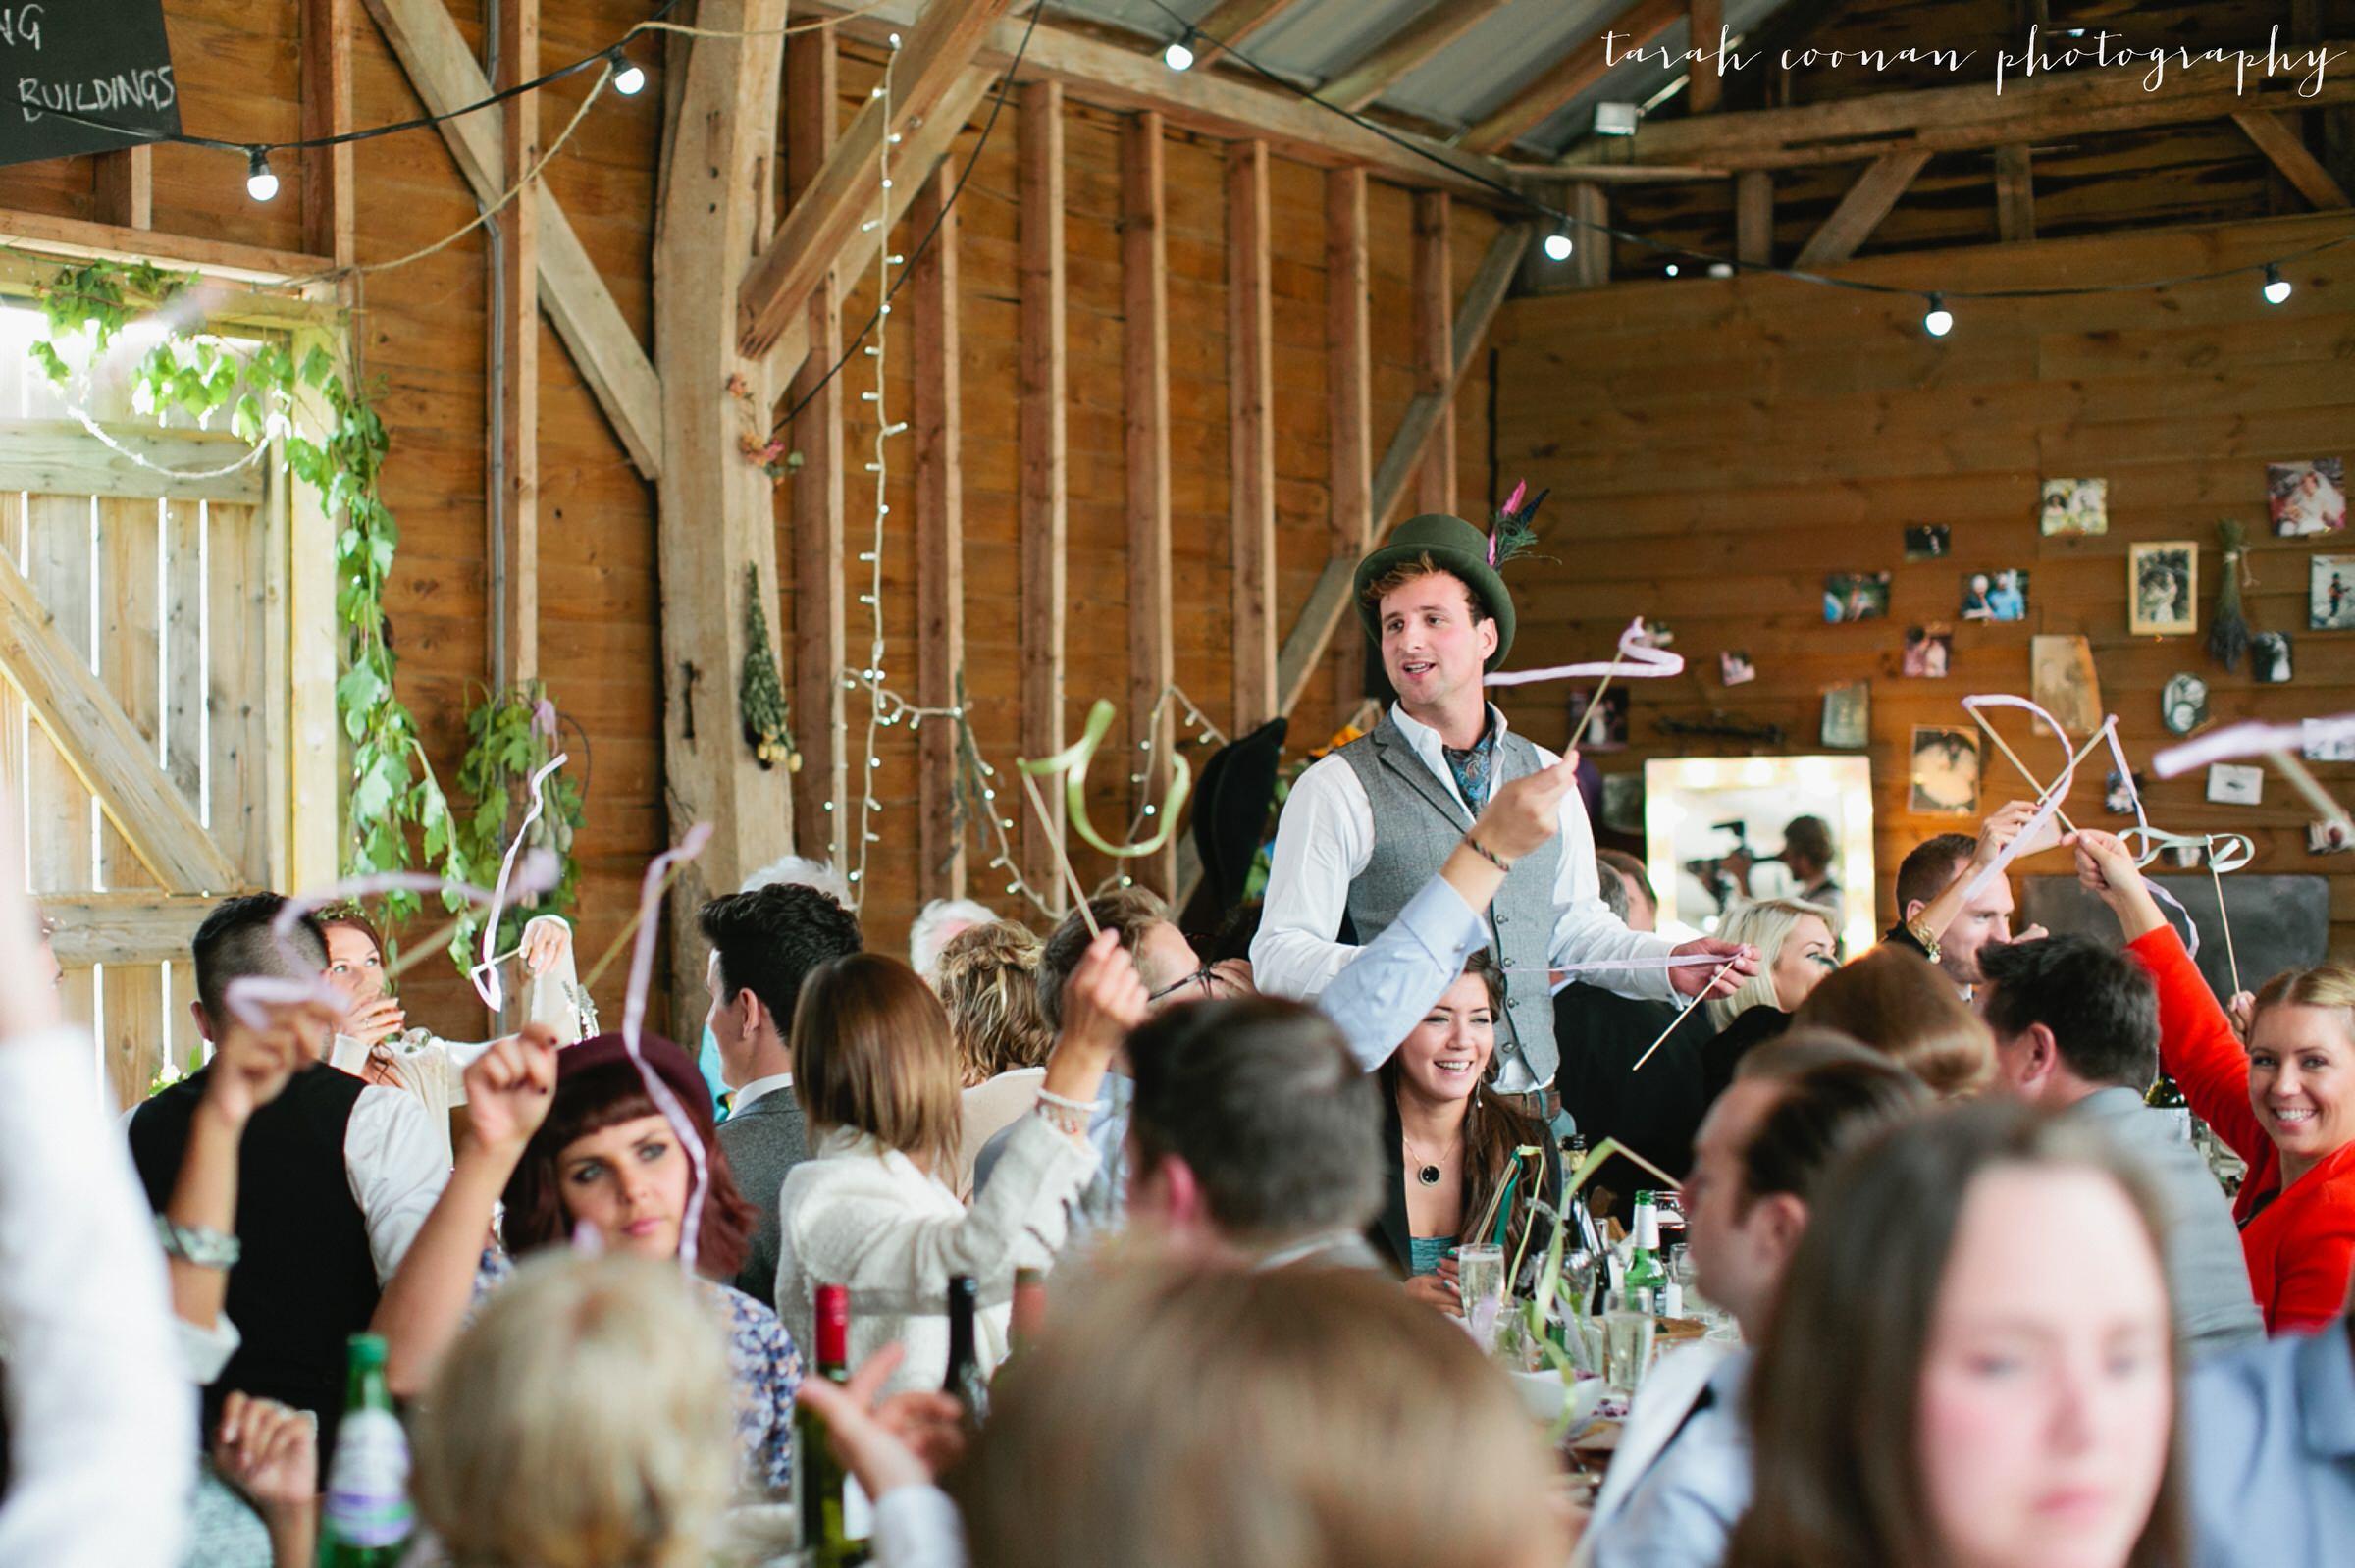 brighton-wedding-photographer77